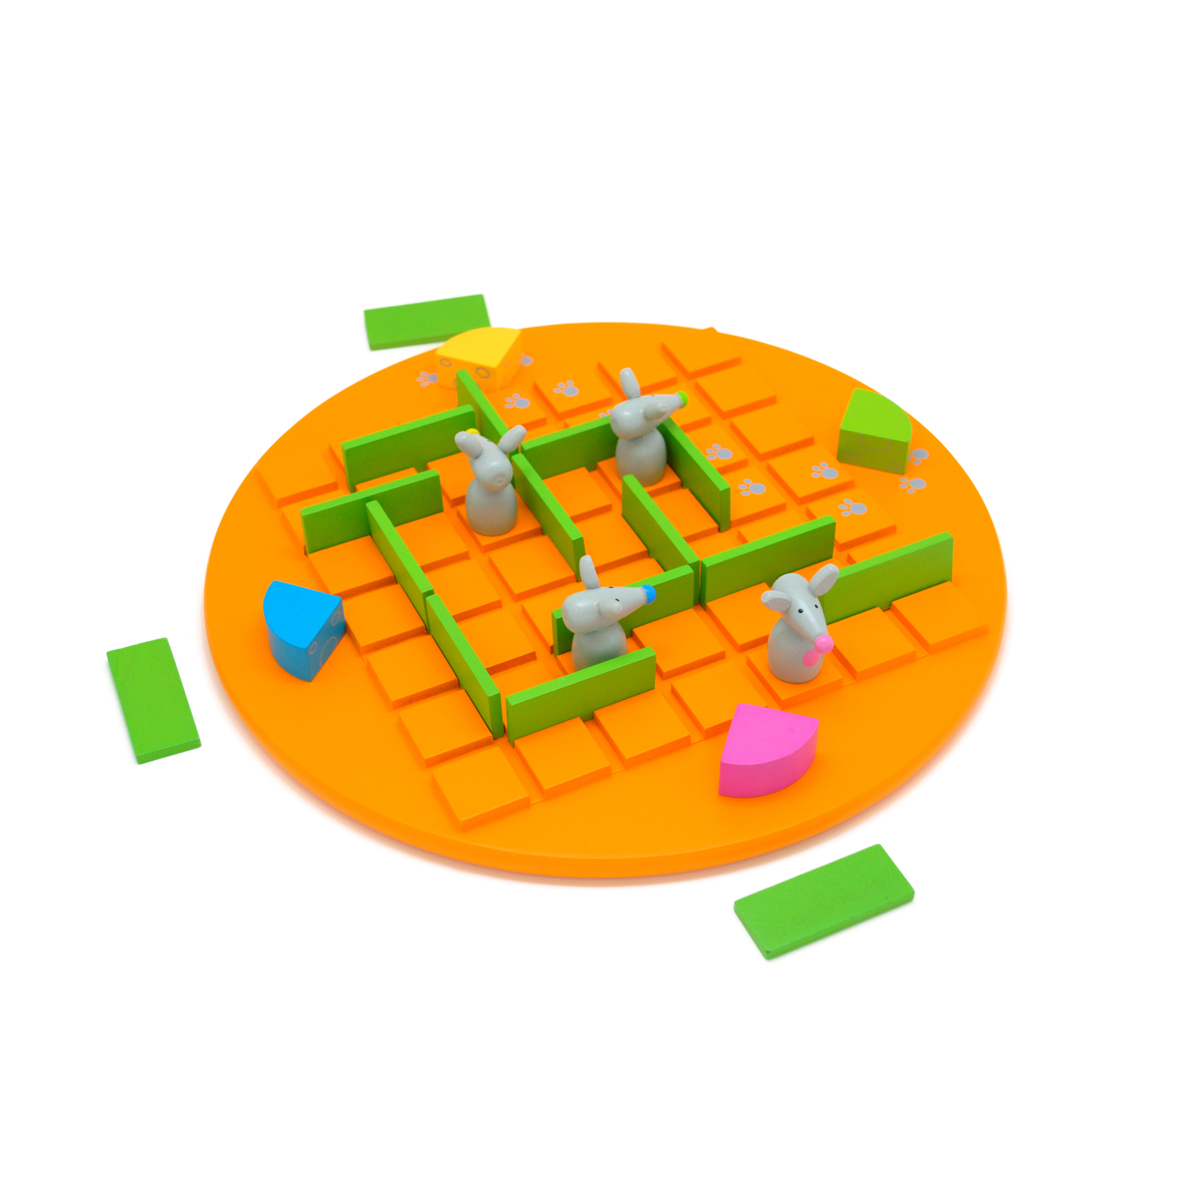 GIGAMIC|親子の対話を生む知育ボードゲーム QUORIDOR Kids (コリドール・キッズ)